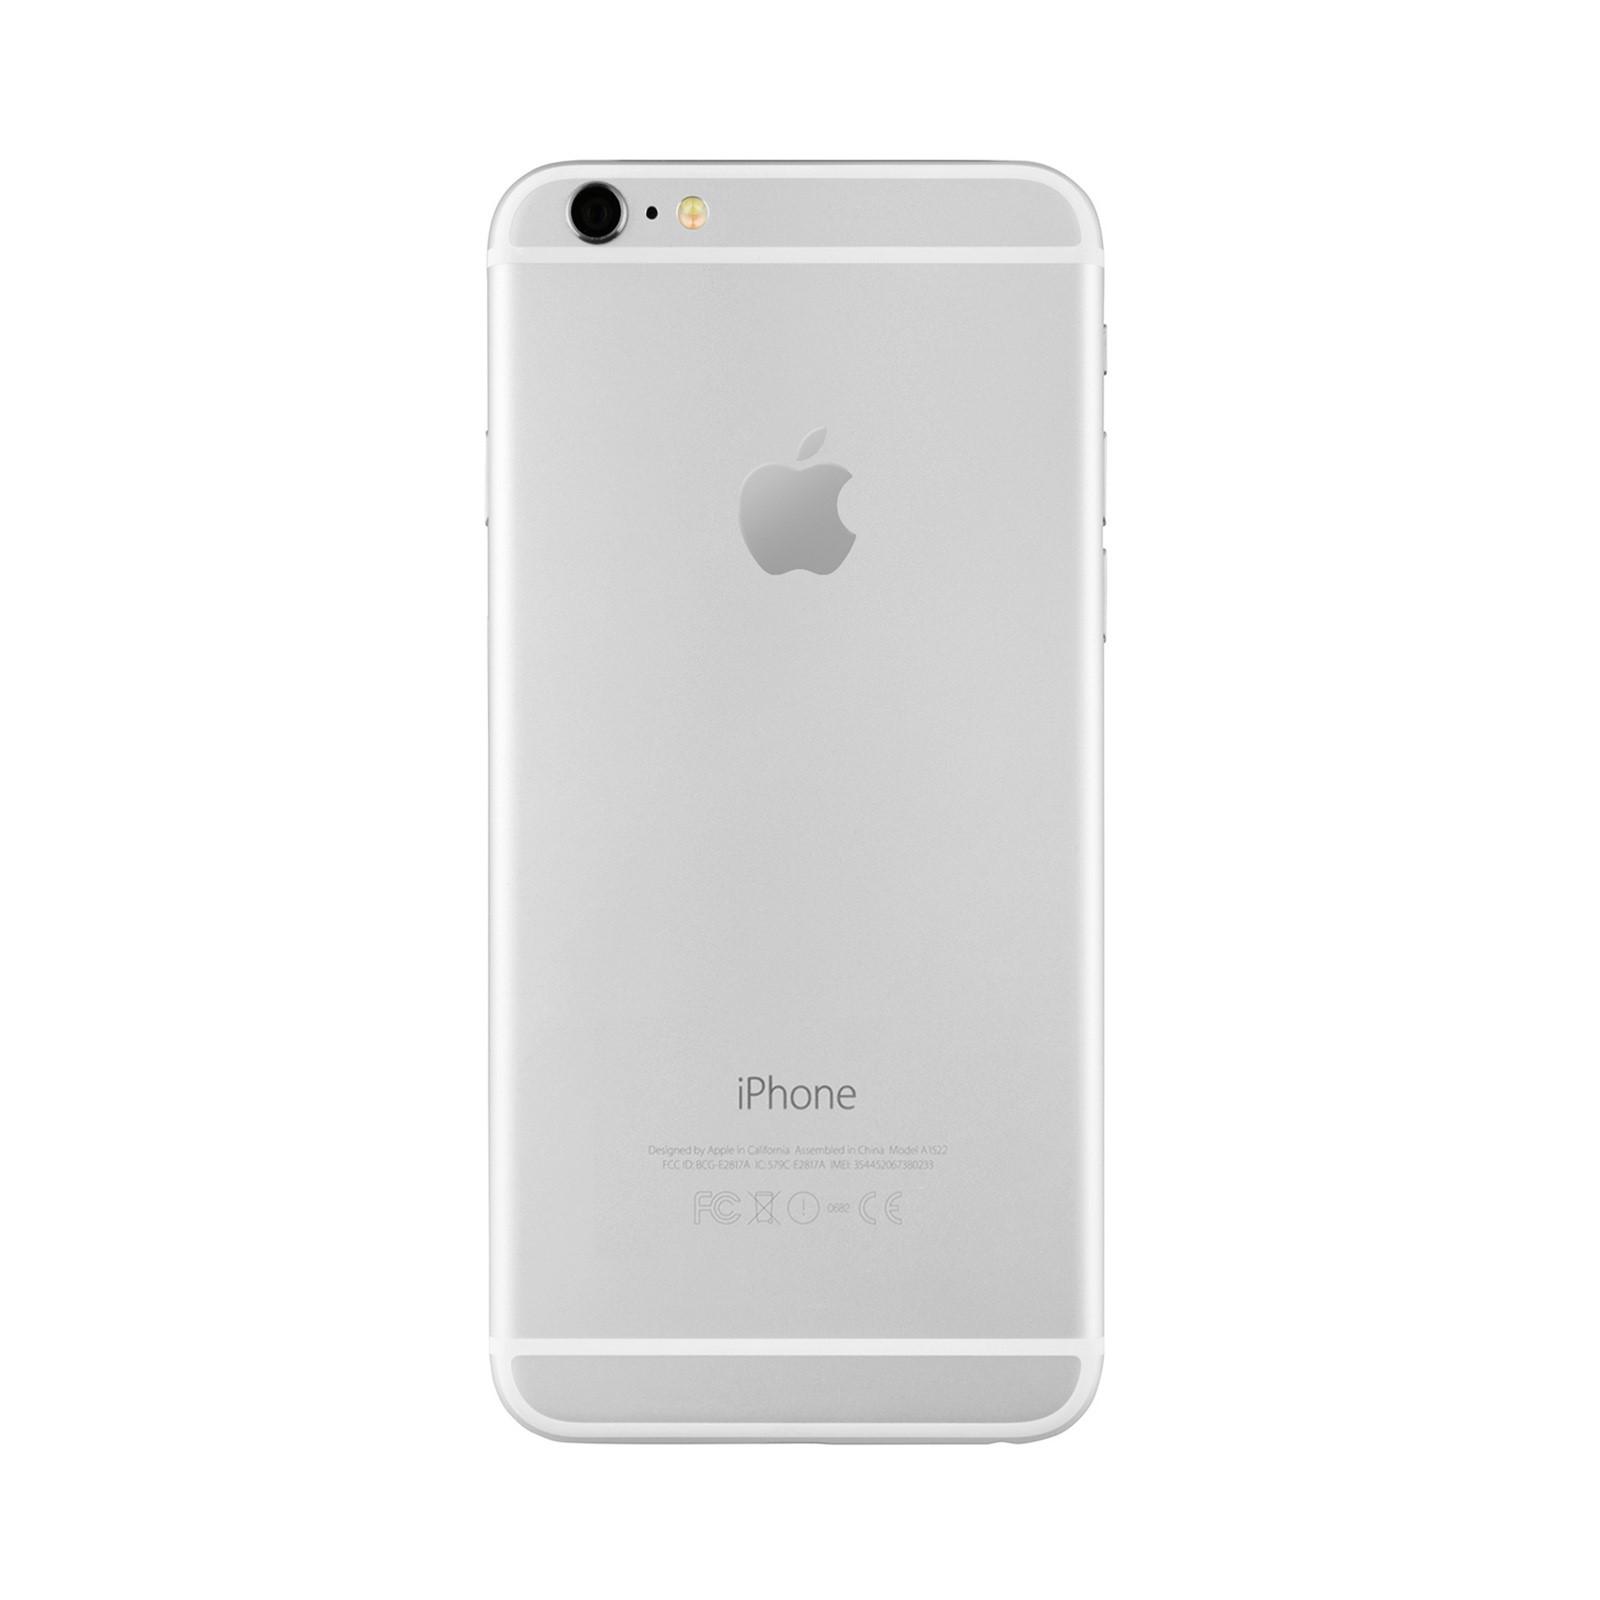 Apple iPhone 6 GSM Factory Unlocked 4G LTE 8MP Camera ...